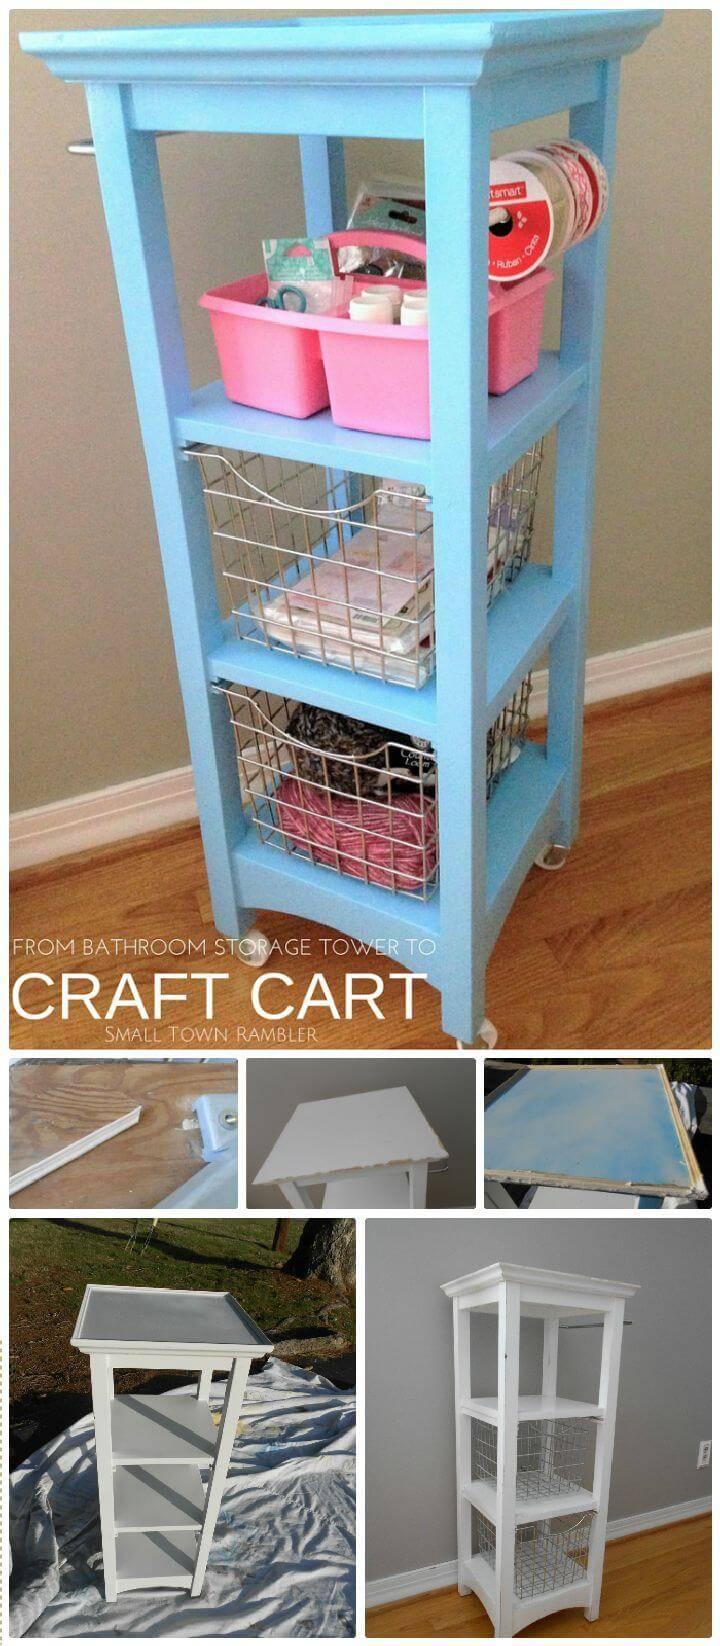 DIY Bathroom Storage Tower Repurposed Into a Craft Cart